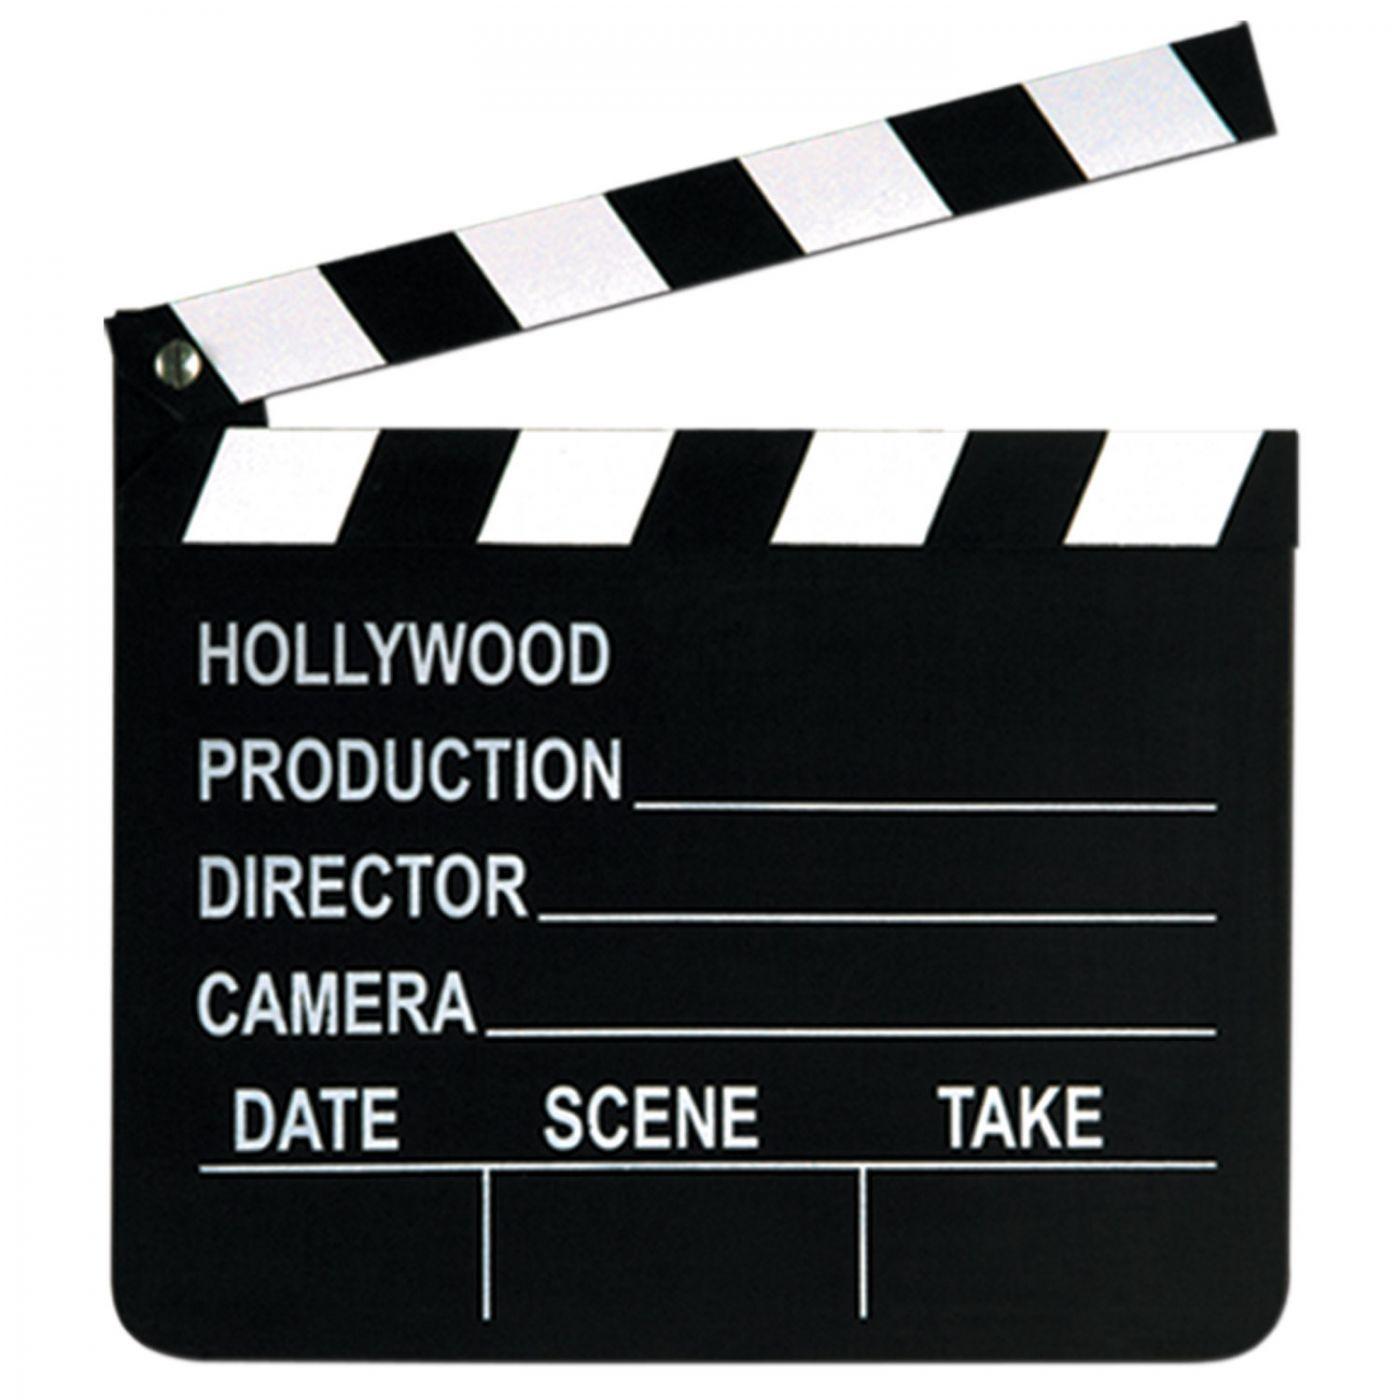 Movie Set Clapboard image